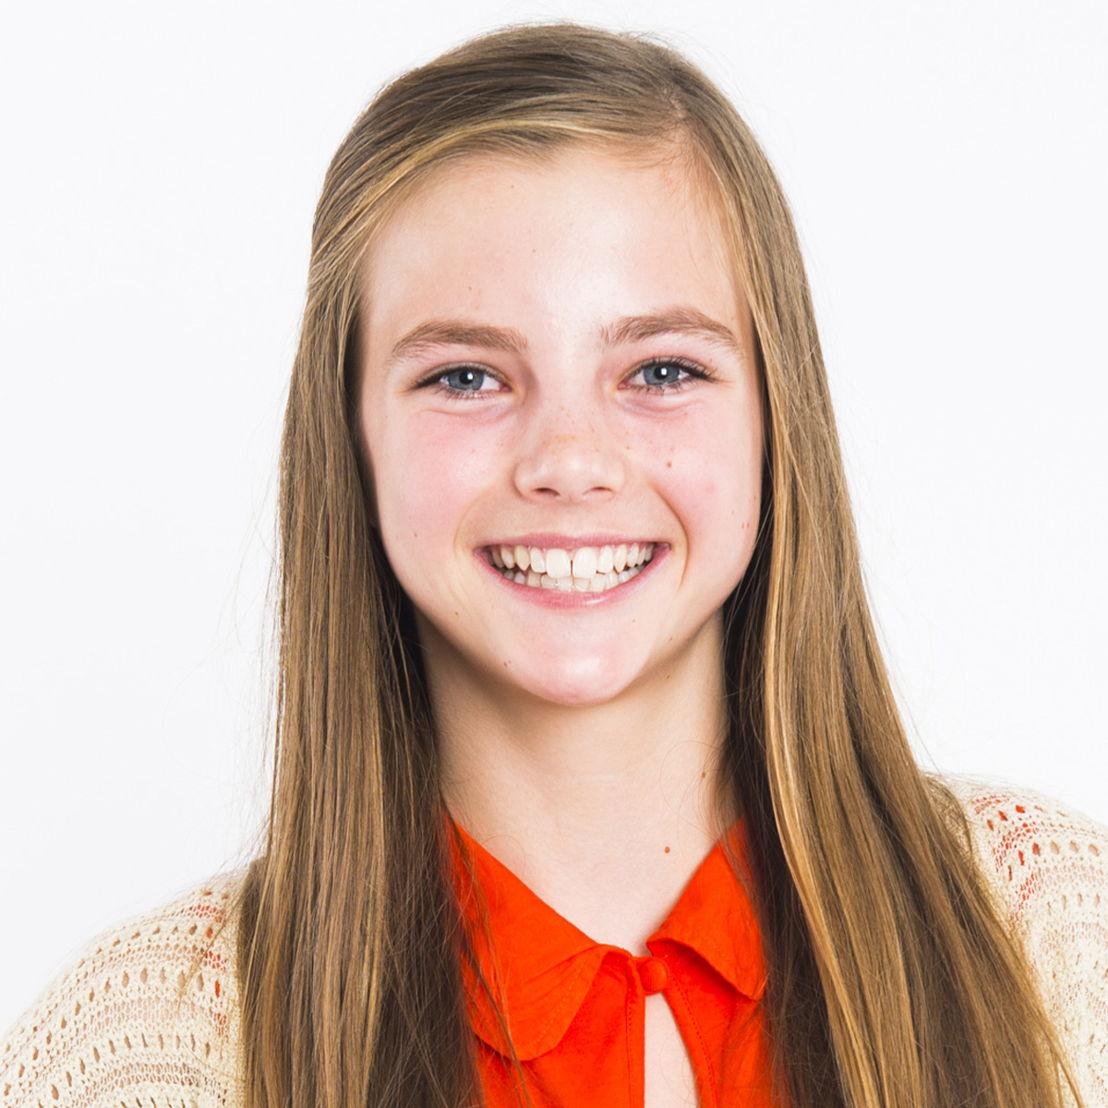 Junior Musical - Emma Van Abbenyen - (c) VRT - Frederik Beyens